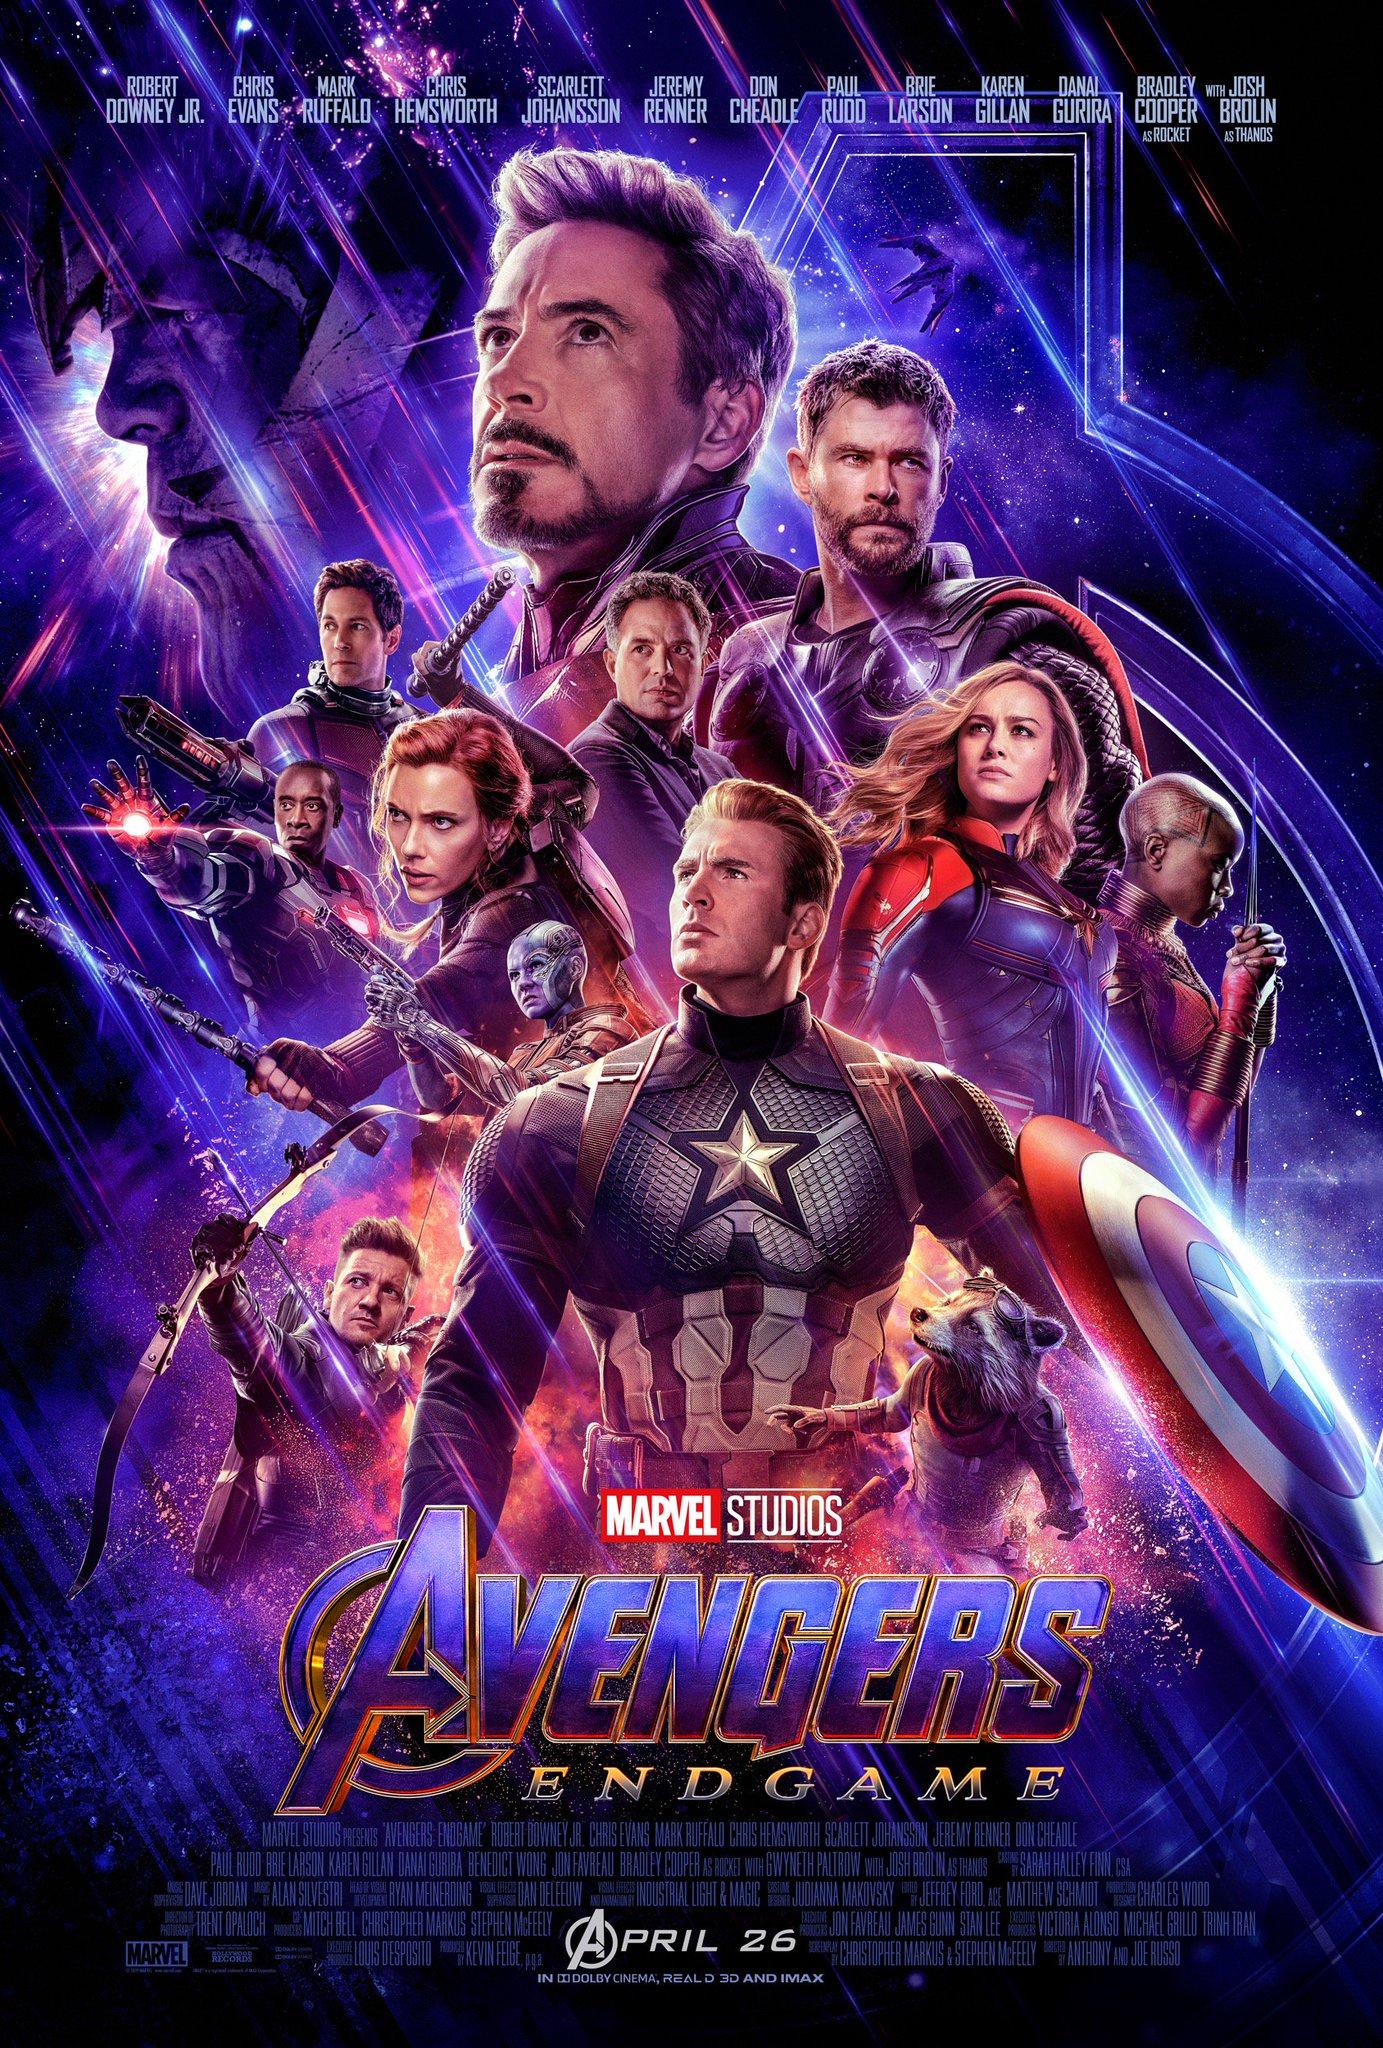 Avengers: Endgame   (2019) dir. Anthony & Joe Russo Rated: PG-13  image: ©2019  Walt Disney Studios Motion Pictures